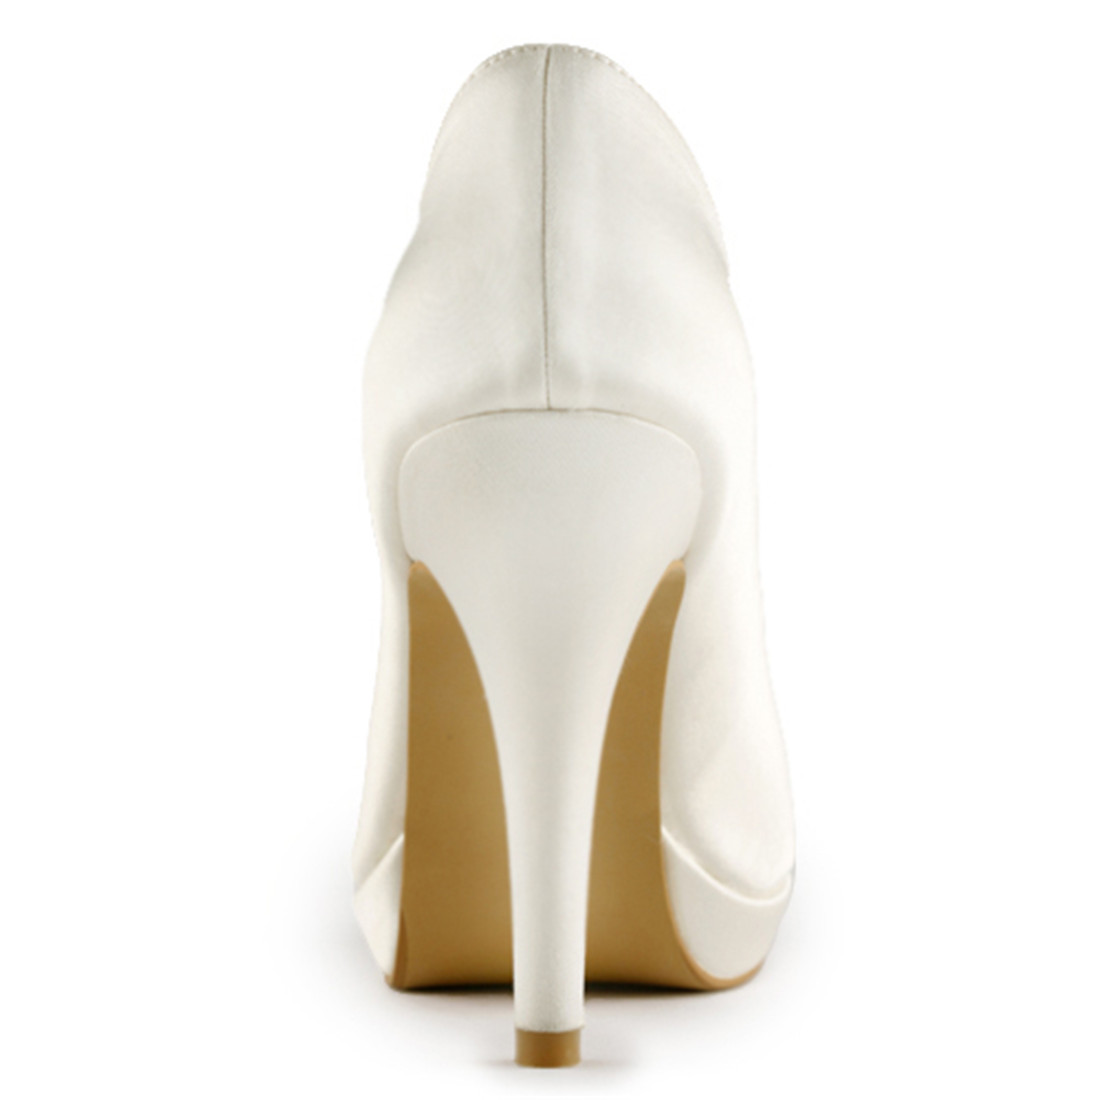 Elegantes tacones altos para novia dama de honor marfil blanco champán zapatos de plataforma de satén de lujo zapatos de boda Uninnova 521 1 LY - 6